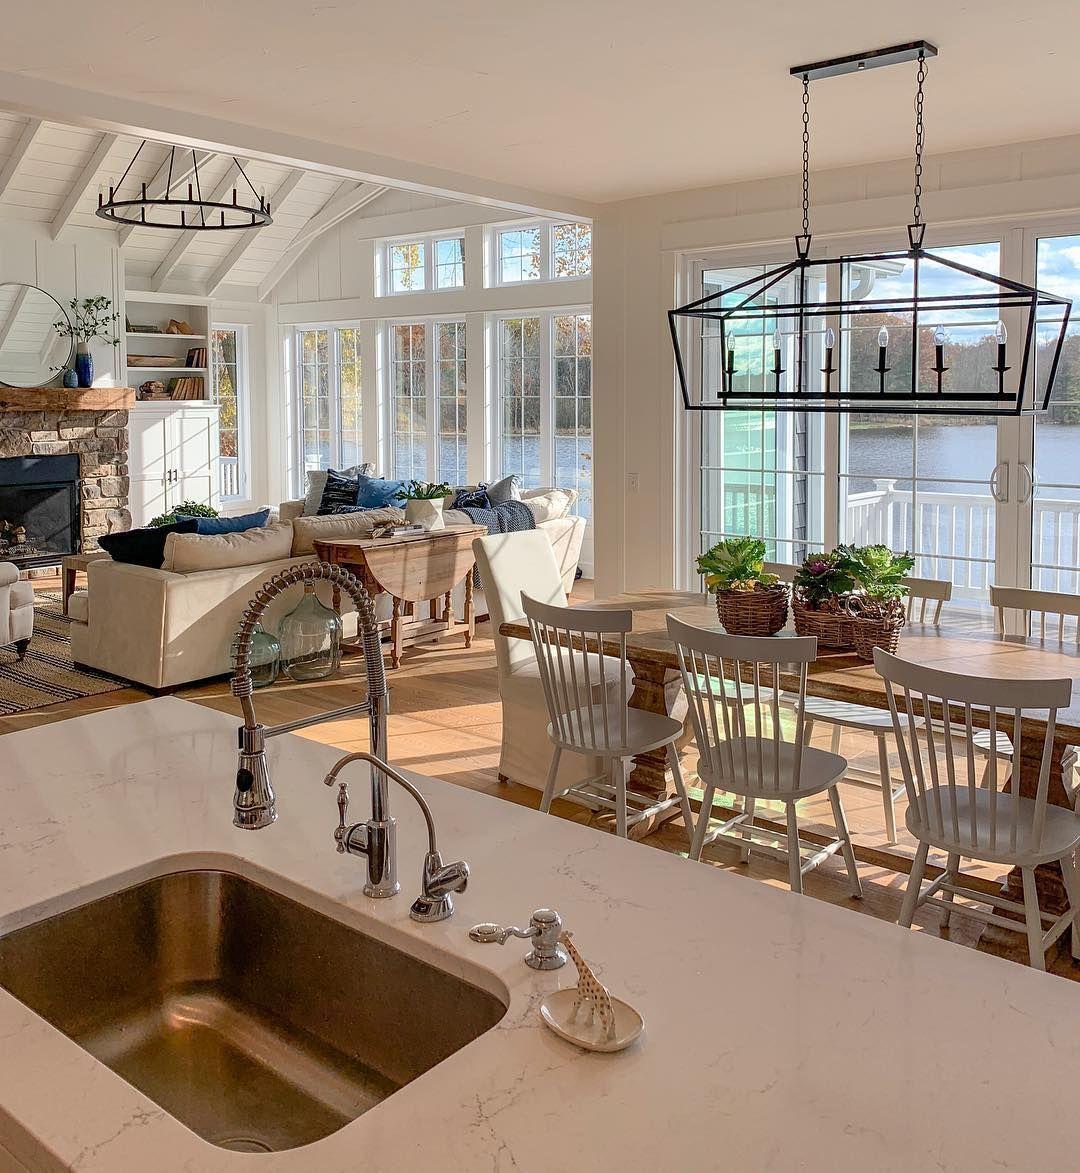 Photo of Ablaze Greatest Dwelling Room Furnishings #residence #LivingRoomMakeover – World Best #Diy Blogs